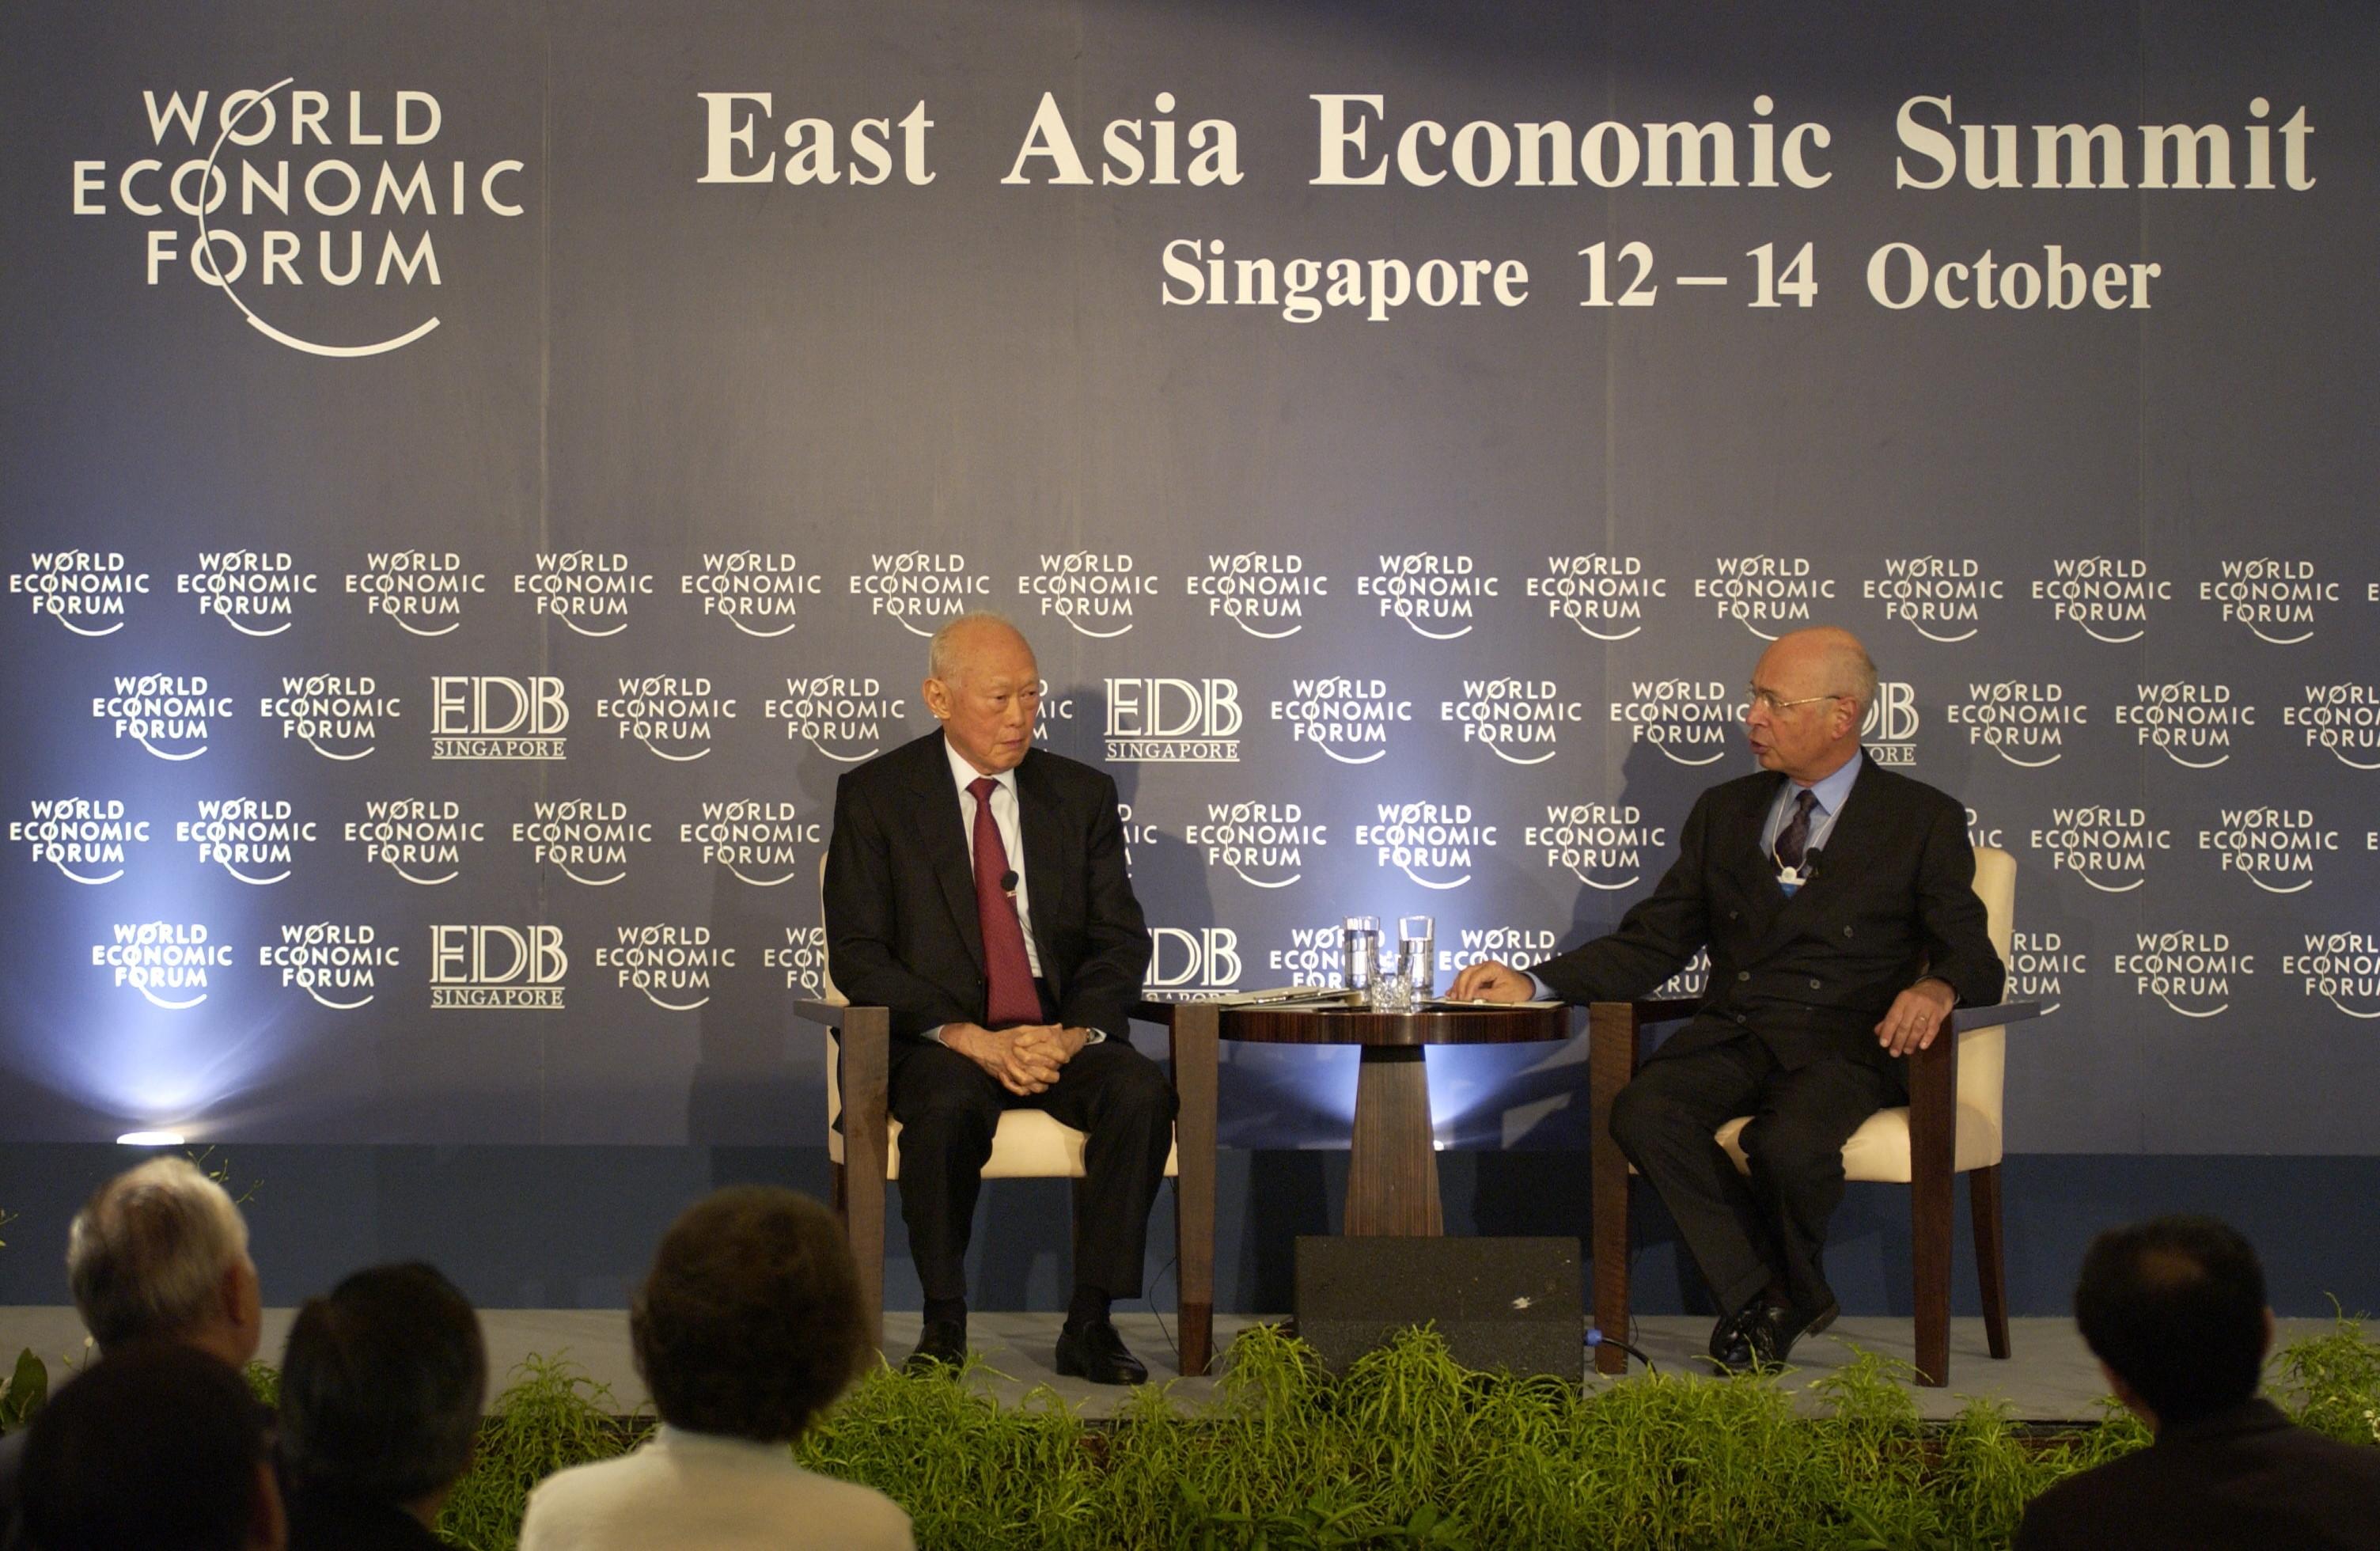 Lee Kuan Yew, Senior Minister, Singapore, having a conversation with Klaus Schwab, Executive Chairman of the World Economic Forum.